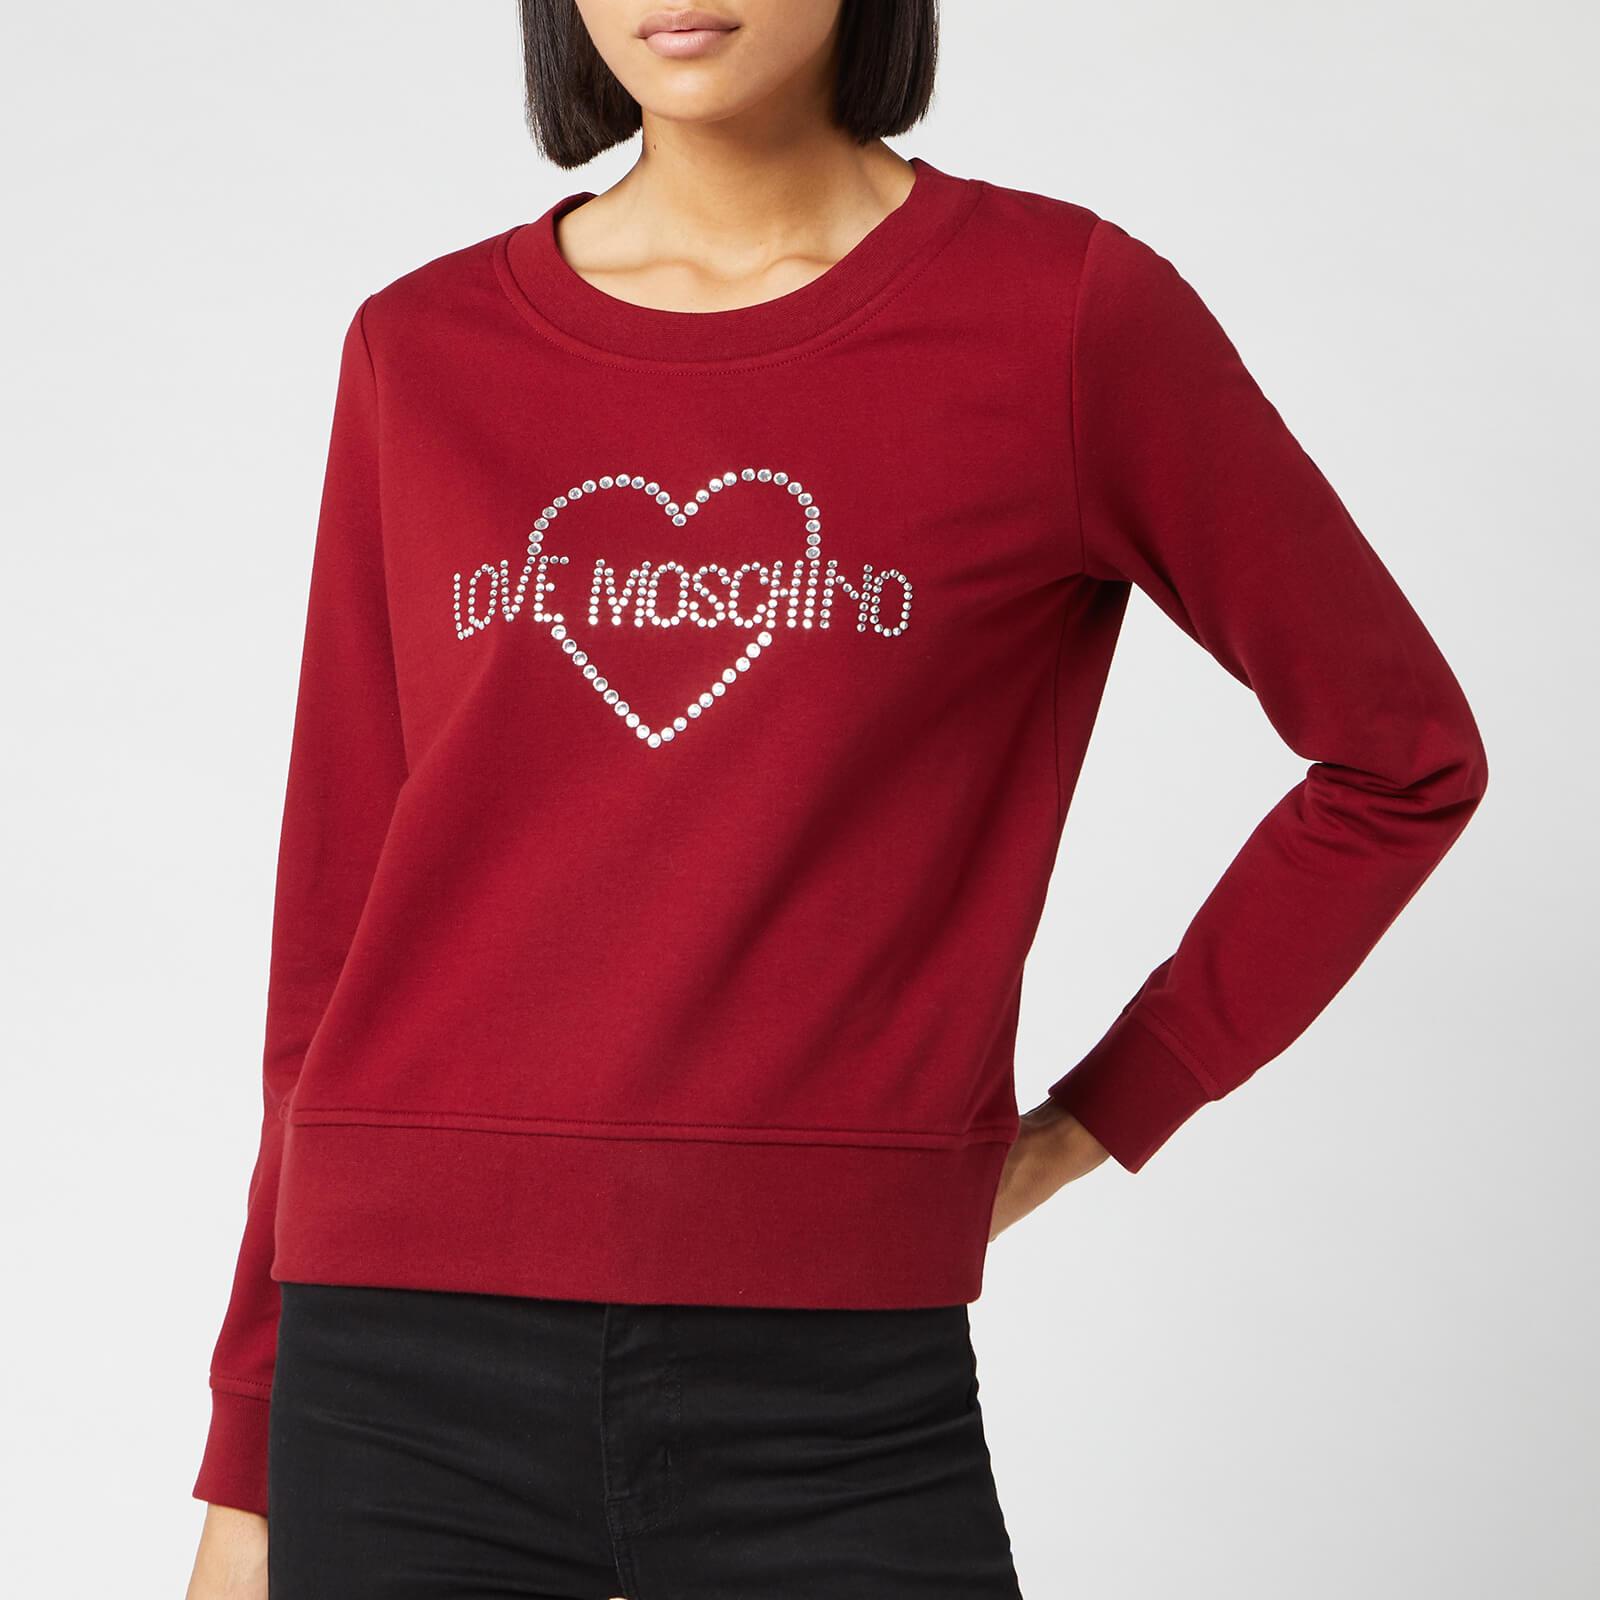 Moschino Love Moschino Women's Crystal Logo Sweater - Red - IT 38/UK 6 - Red